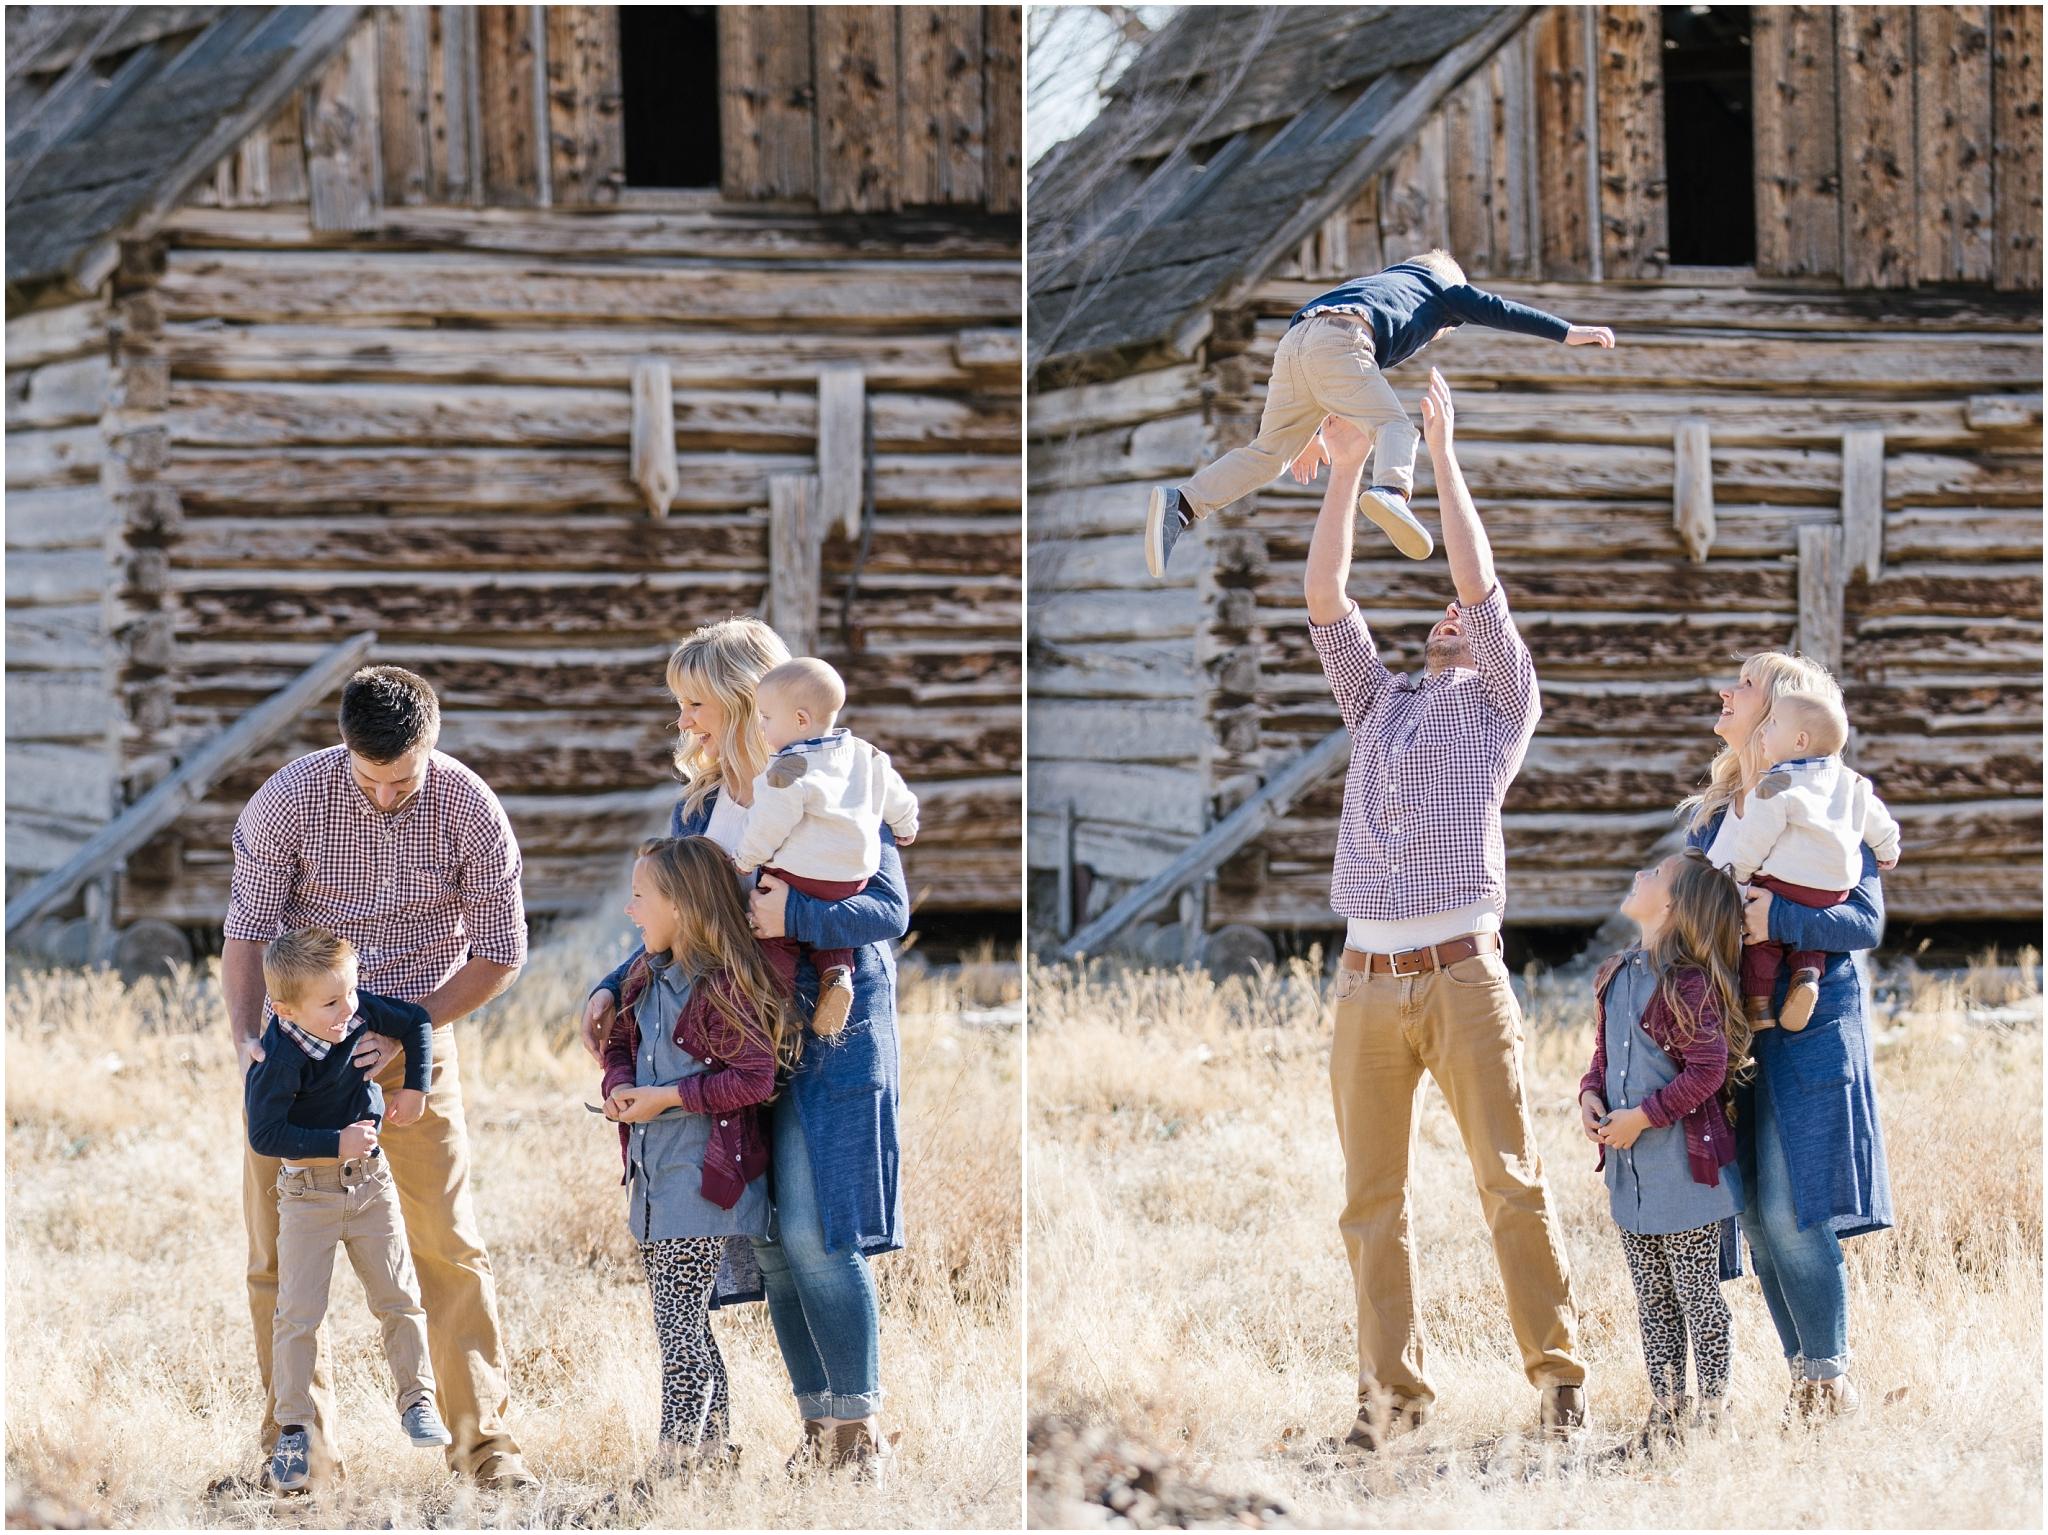 Laws-81_Lizzie-B-Imagery-Utah-Family-Photographer-Salt-Lake-City-Park-City-Davis-County-Clearfield.jpg